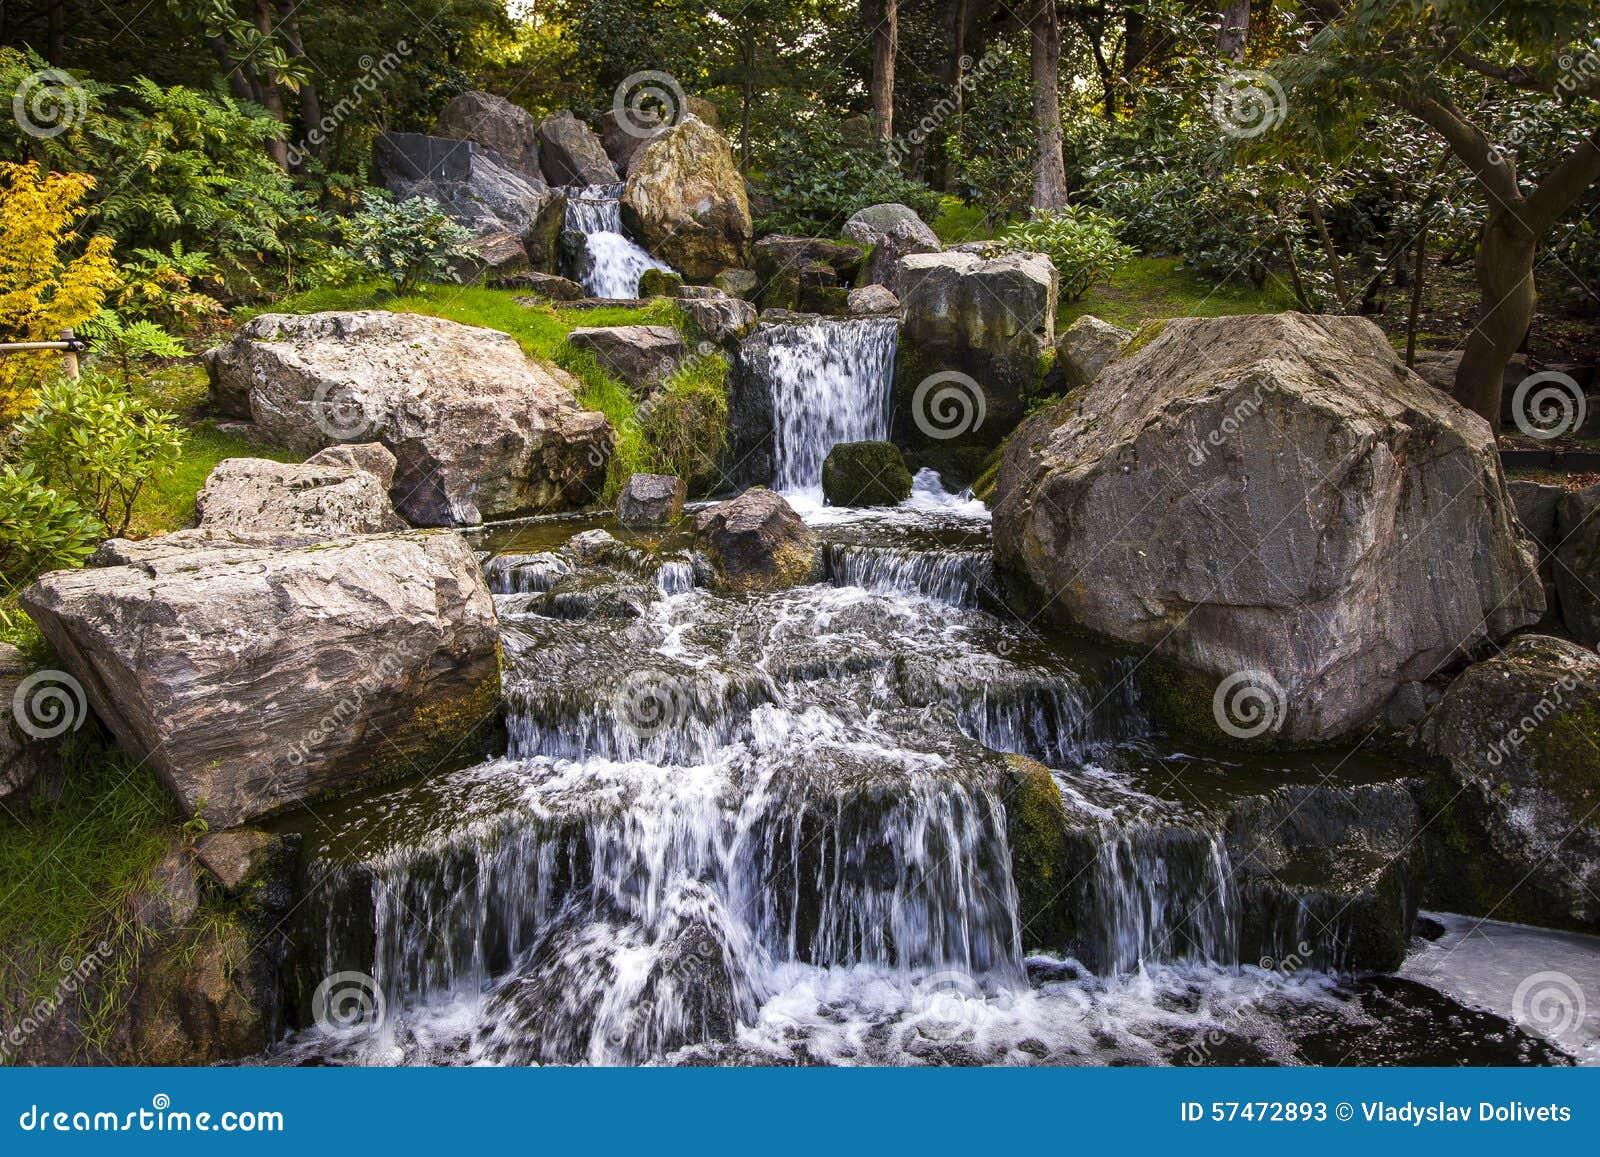 Waterval In Tuin : Waterval muur tuin: erawan jungle waterval tuinposter.